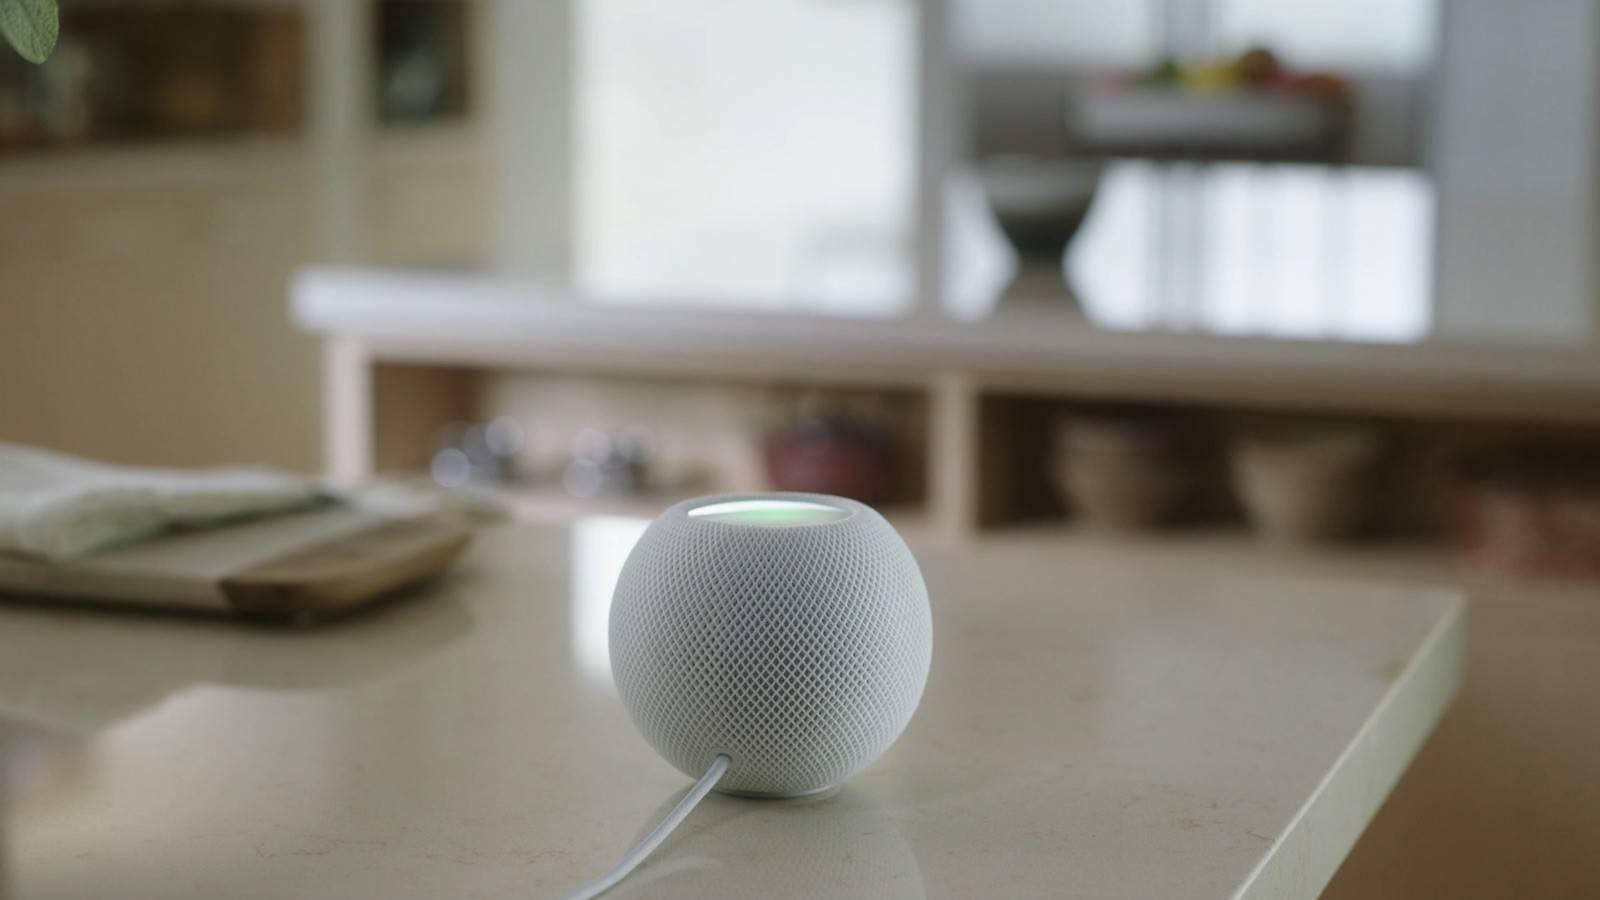 HomePod mini电源线同样不可拆卸:但或能用USB-C移动电源供电